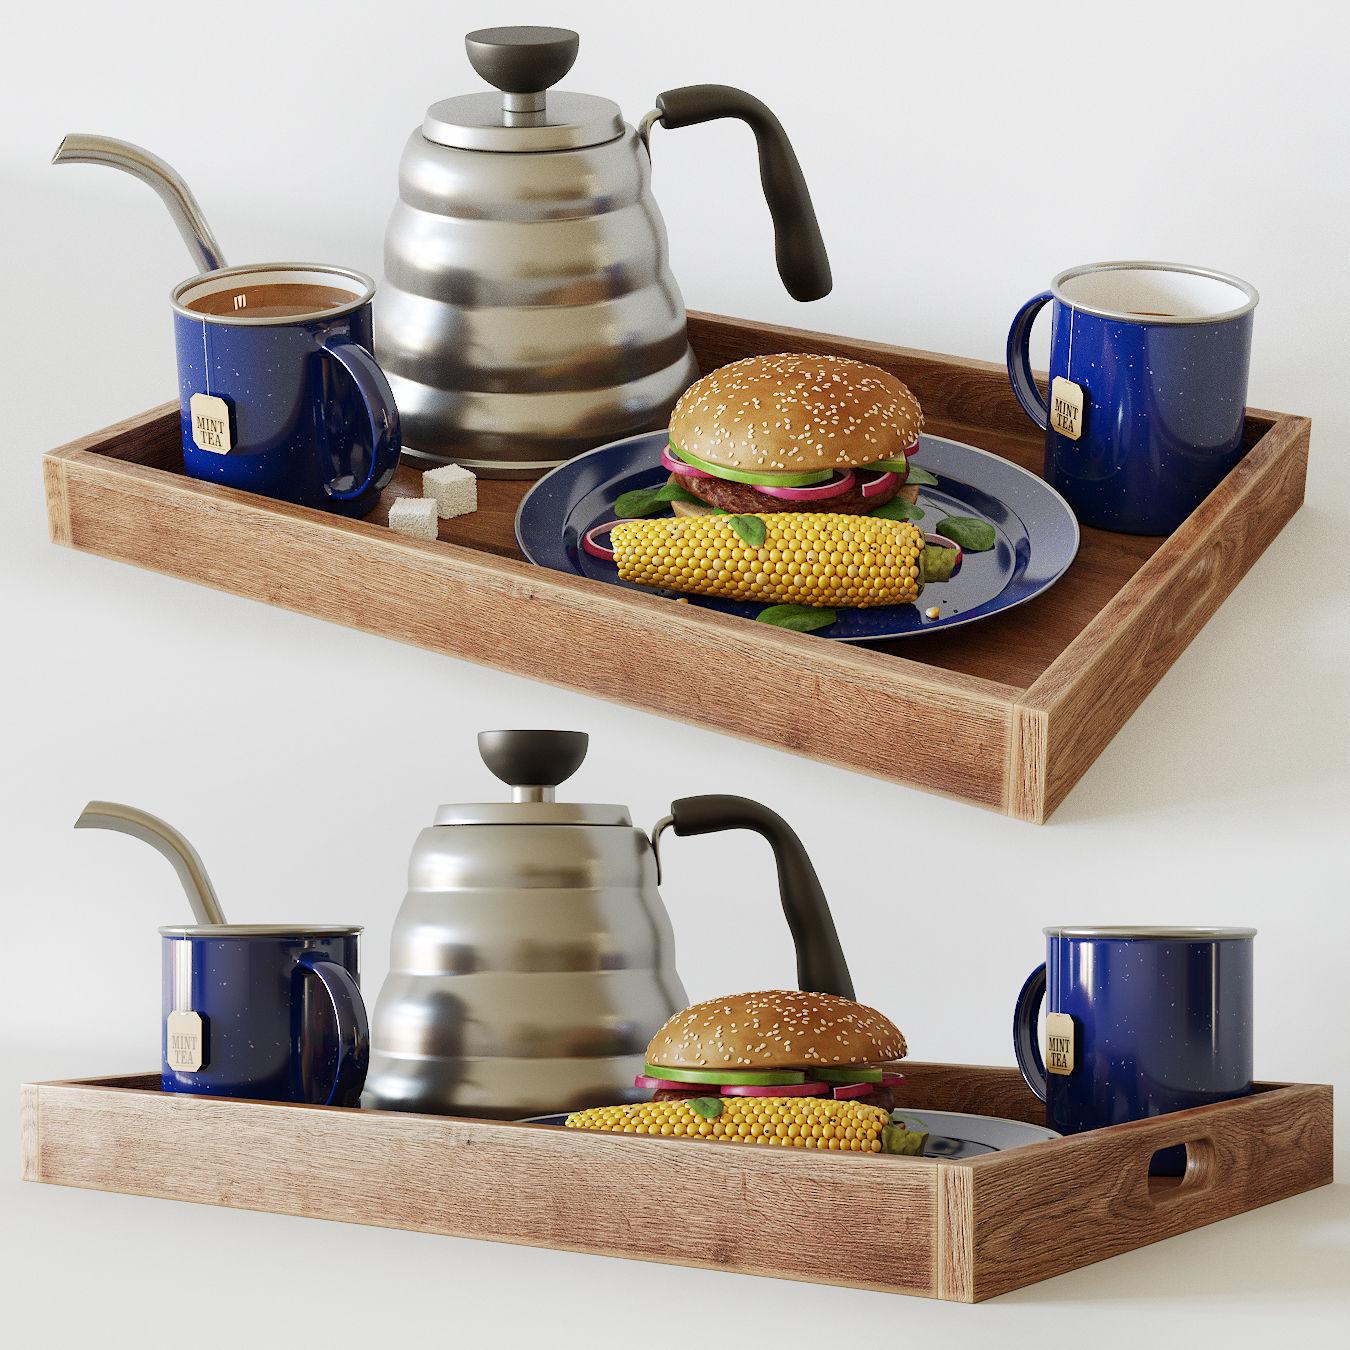 Breakfast decorative set